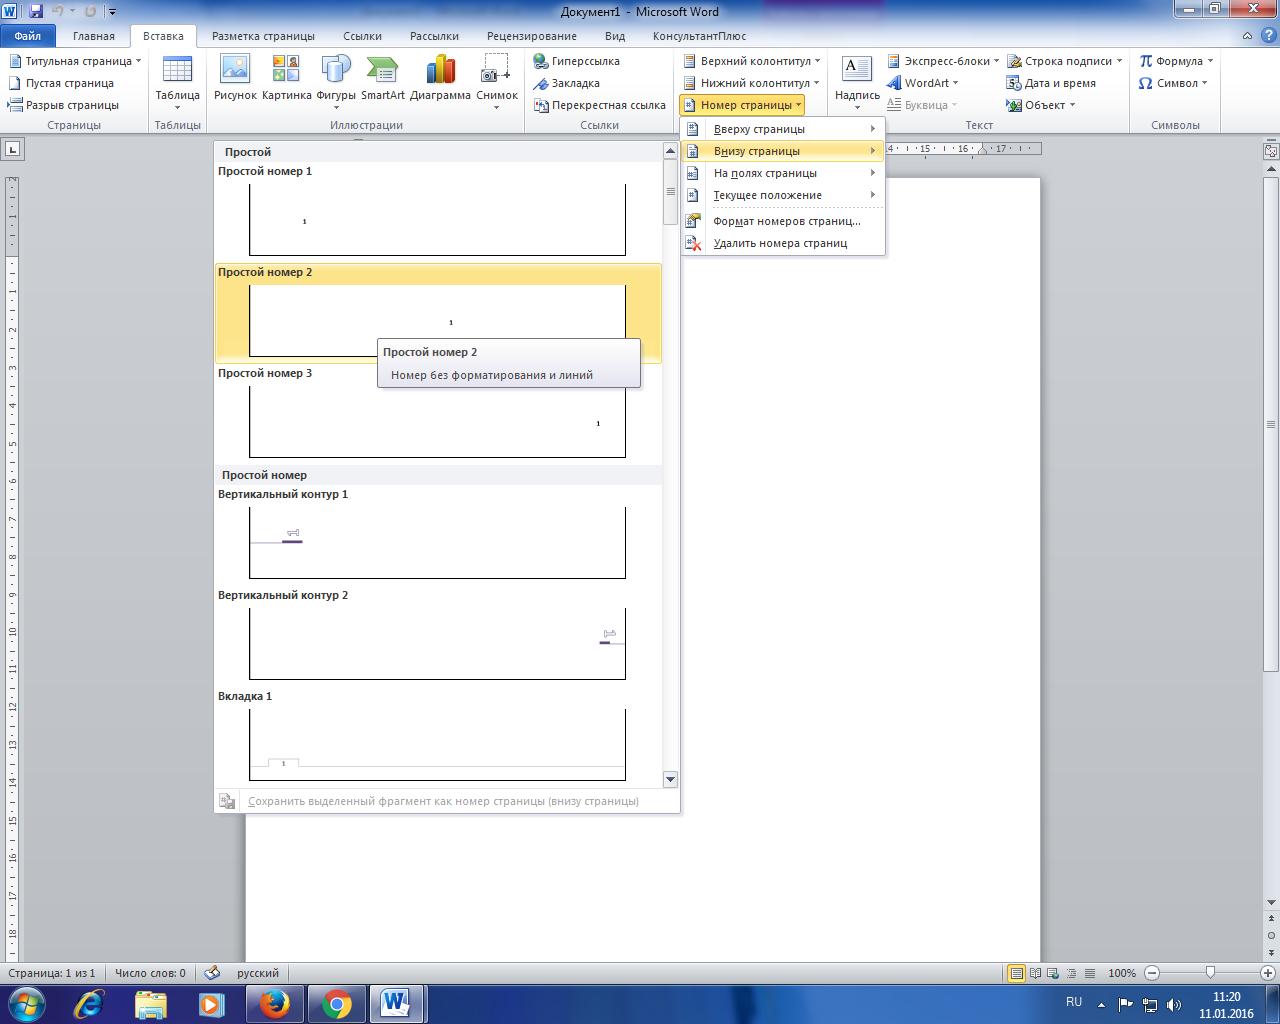 Writer. Страницы. Нумерация страниц - Apache OpenOffice Wiki 23